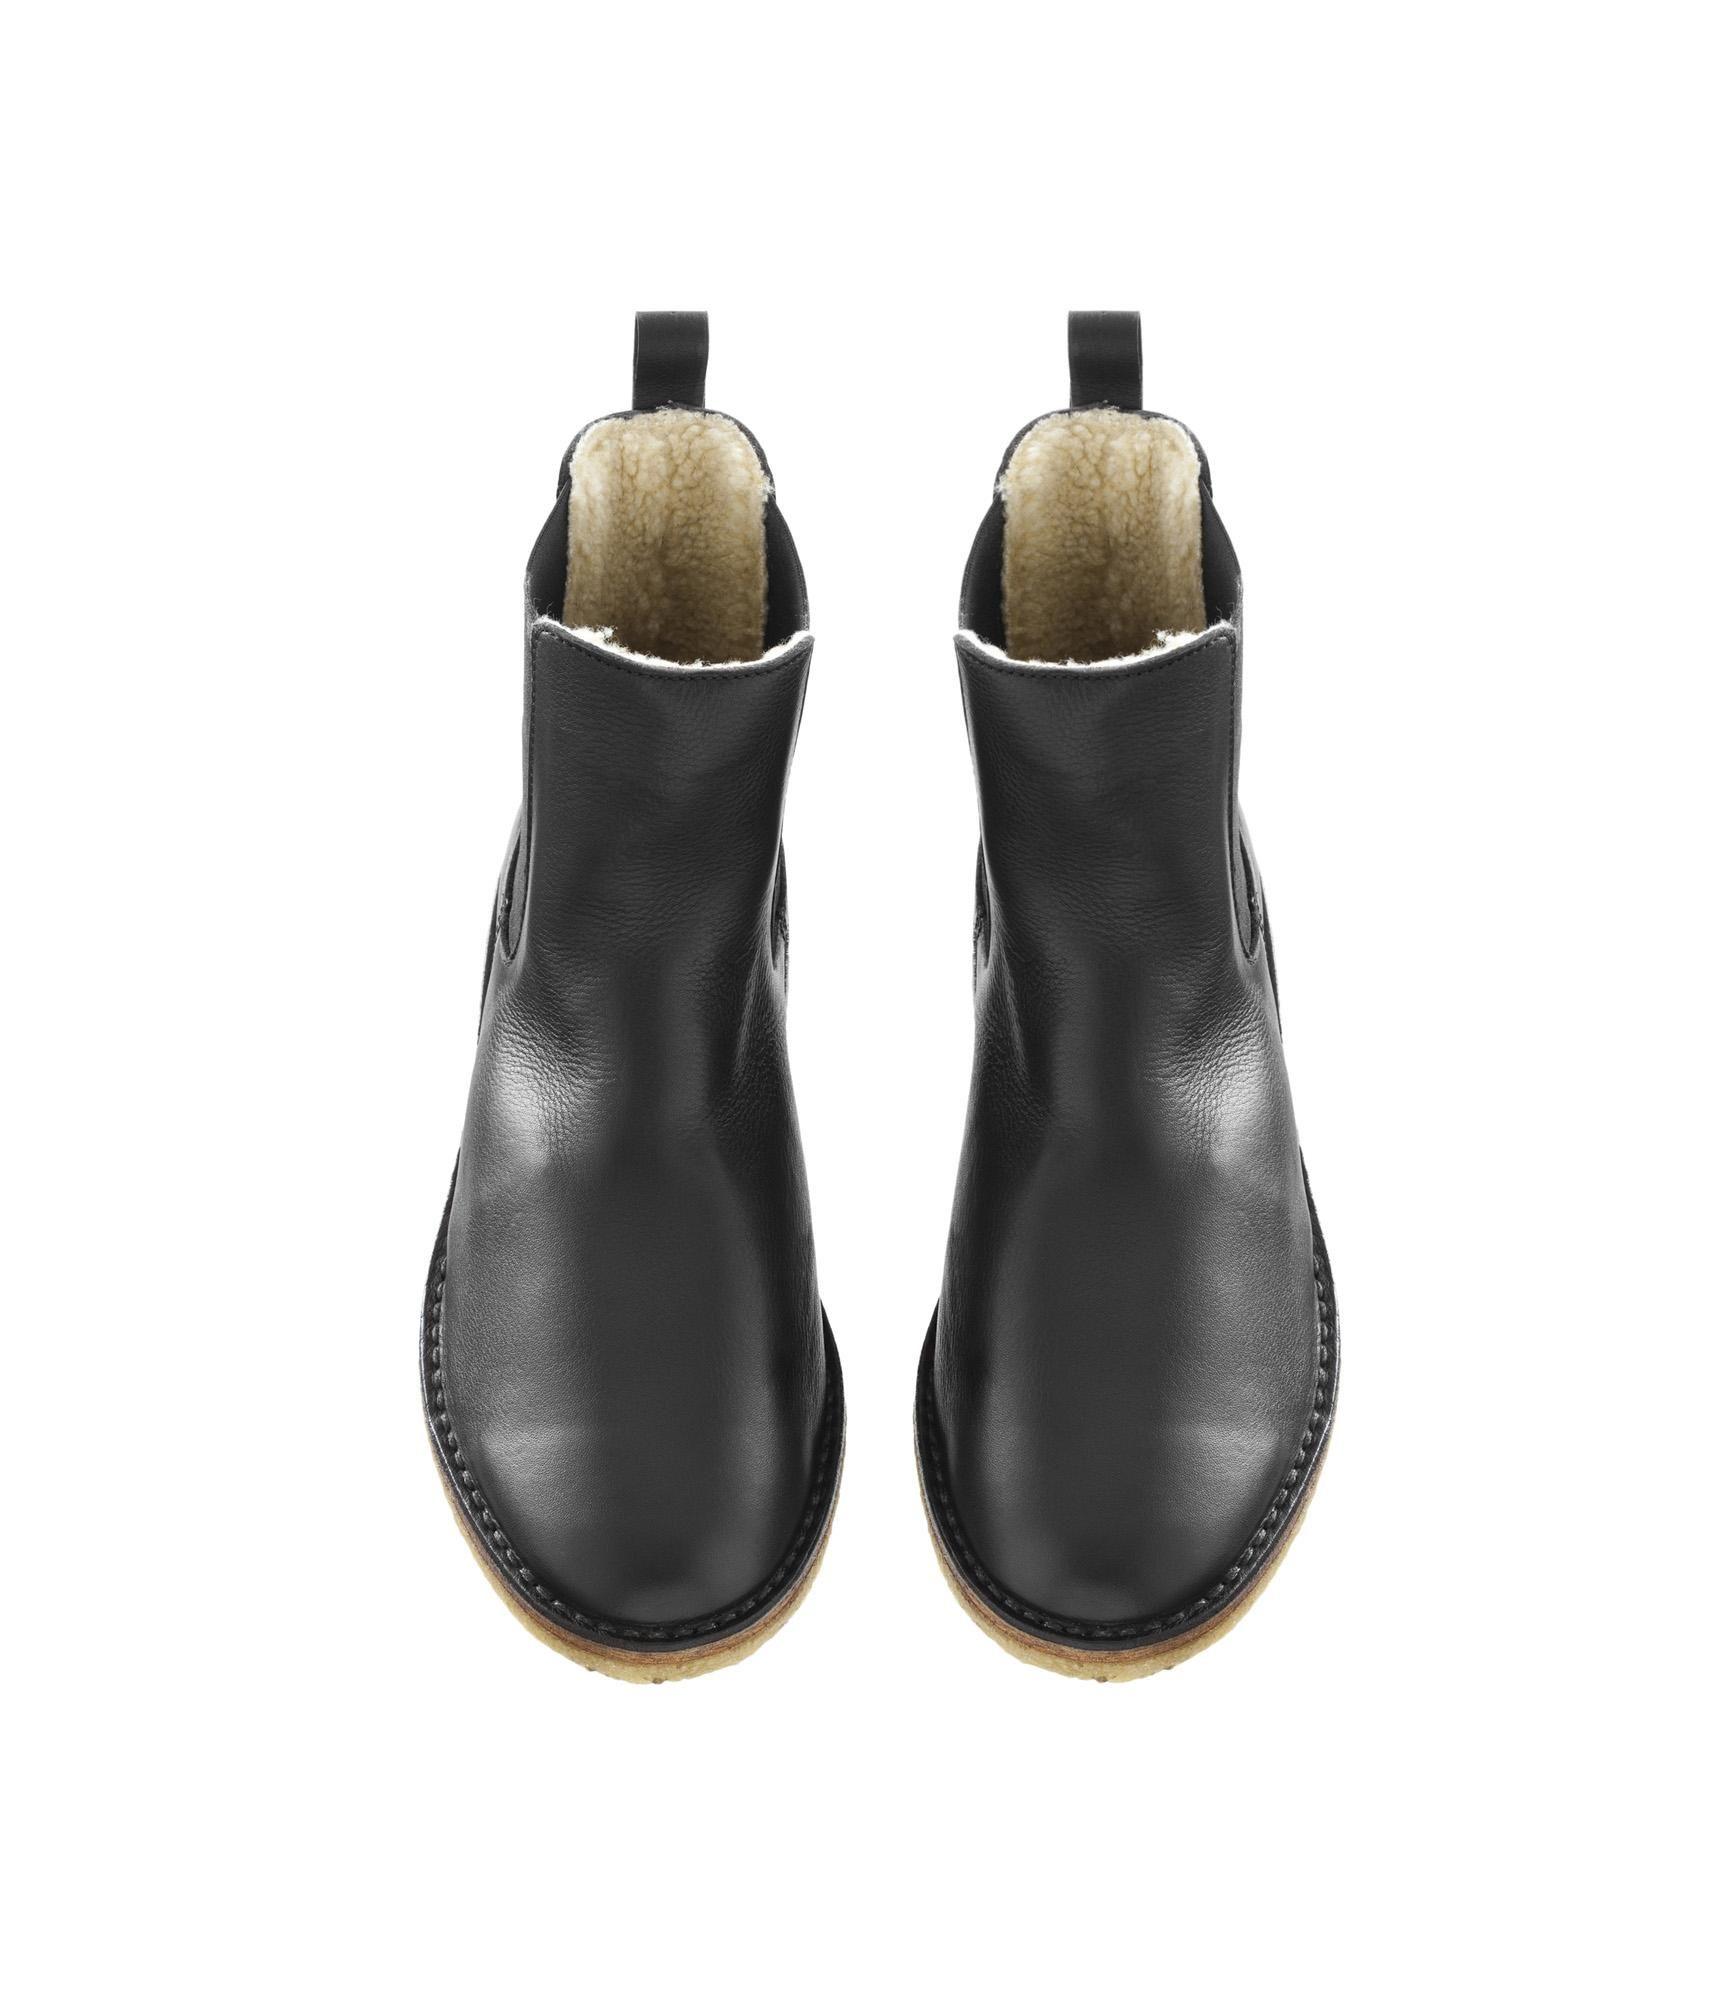 590da492ef8 Fur-lined chelsea boots - BLACK - A.P.C. MEN | Fashion? | Mens fur ...